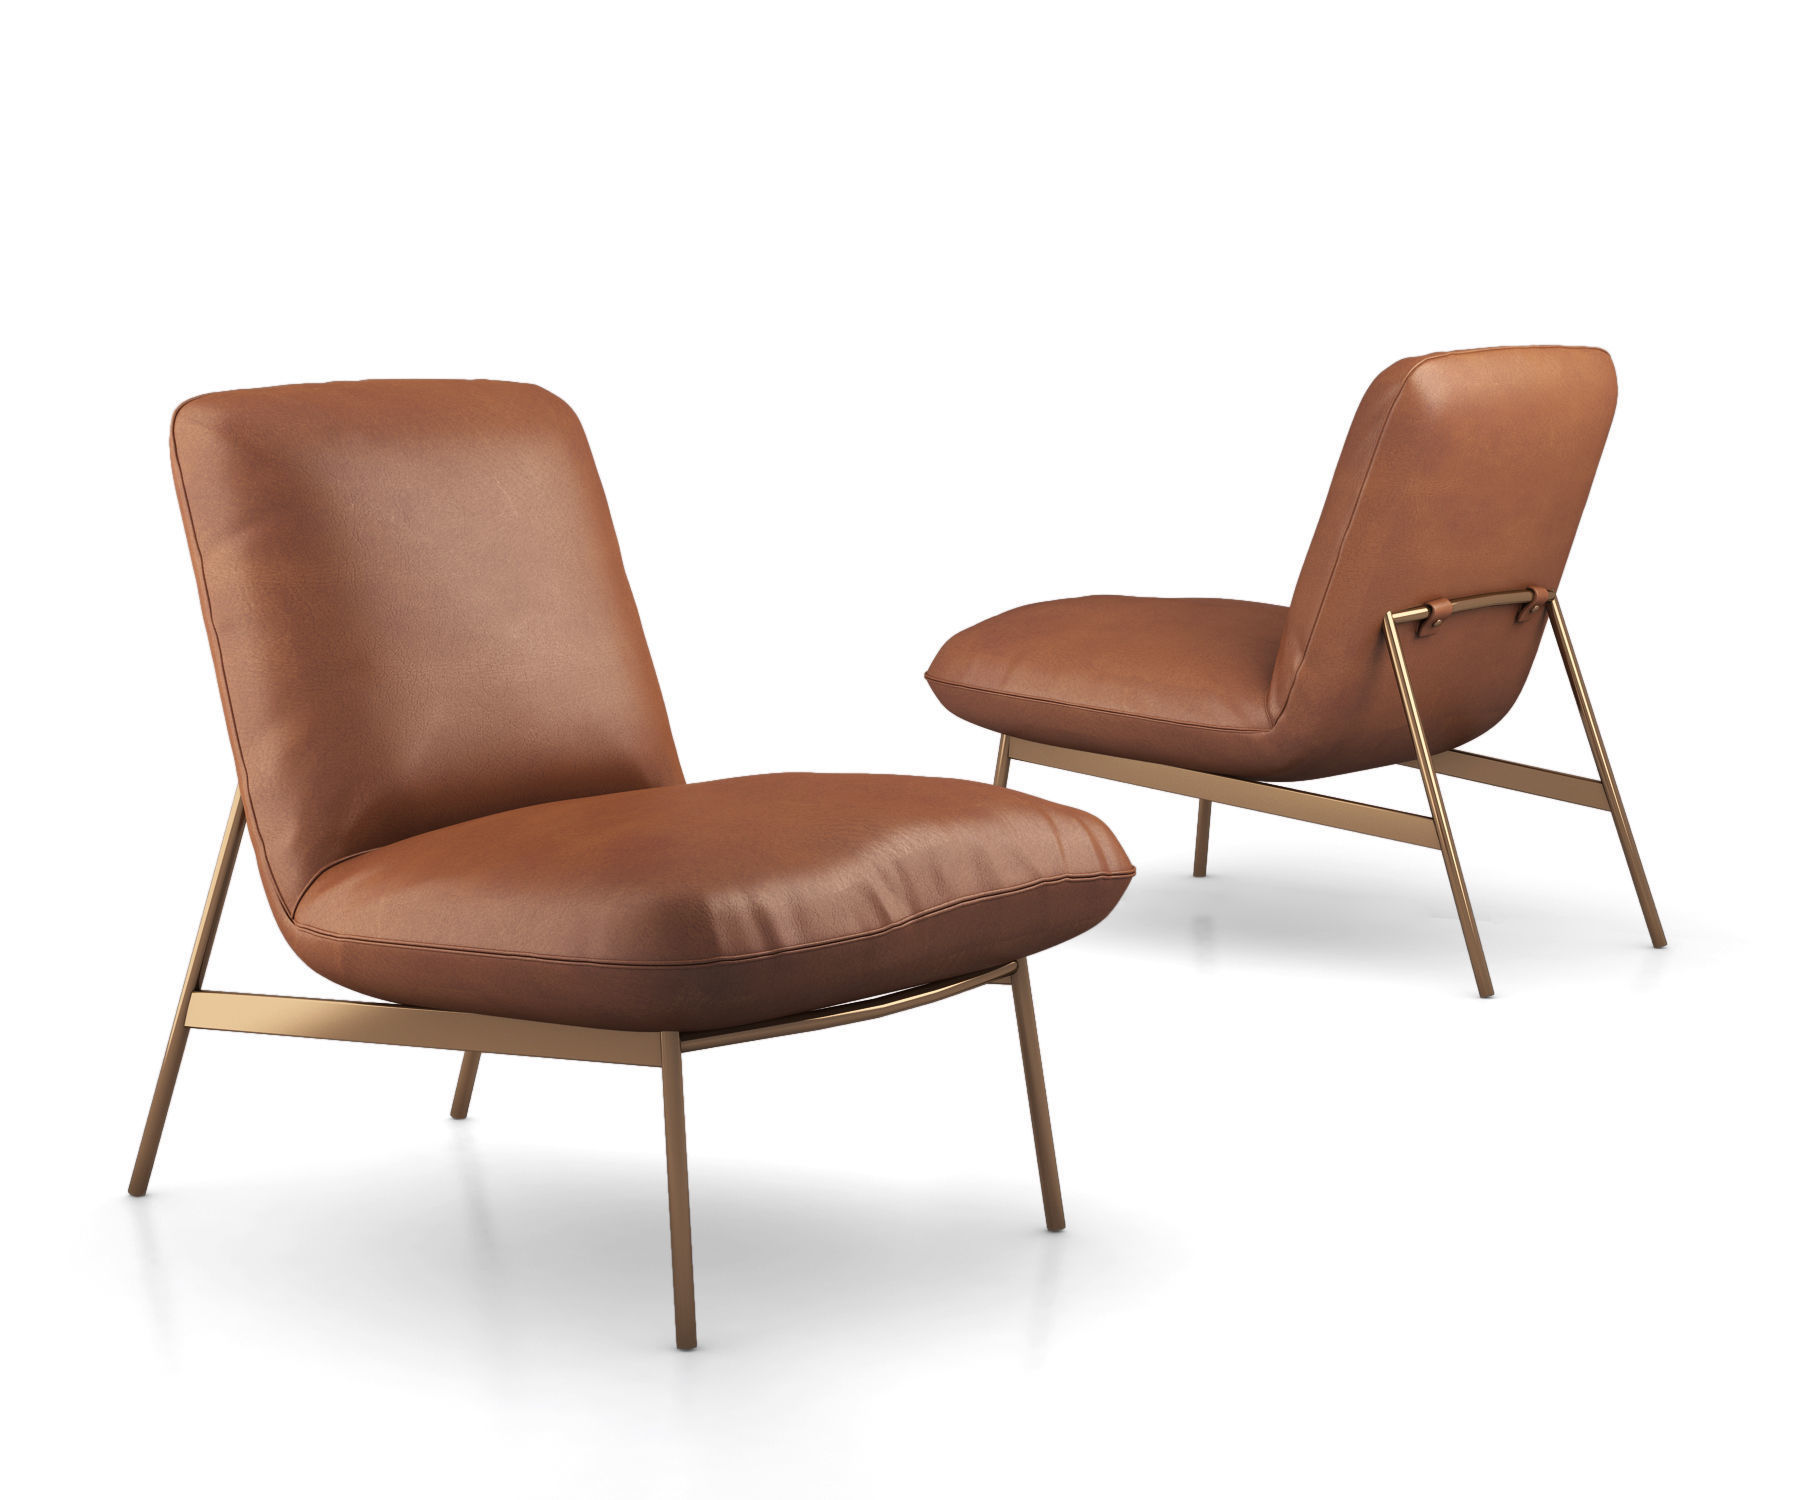 Brooks Slipper Chair by West Elm